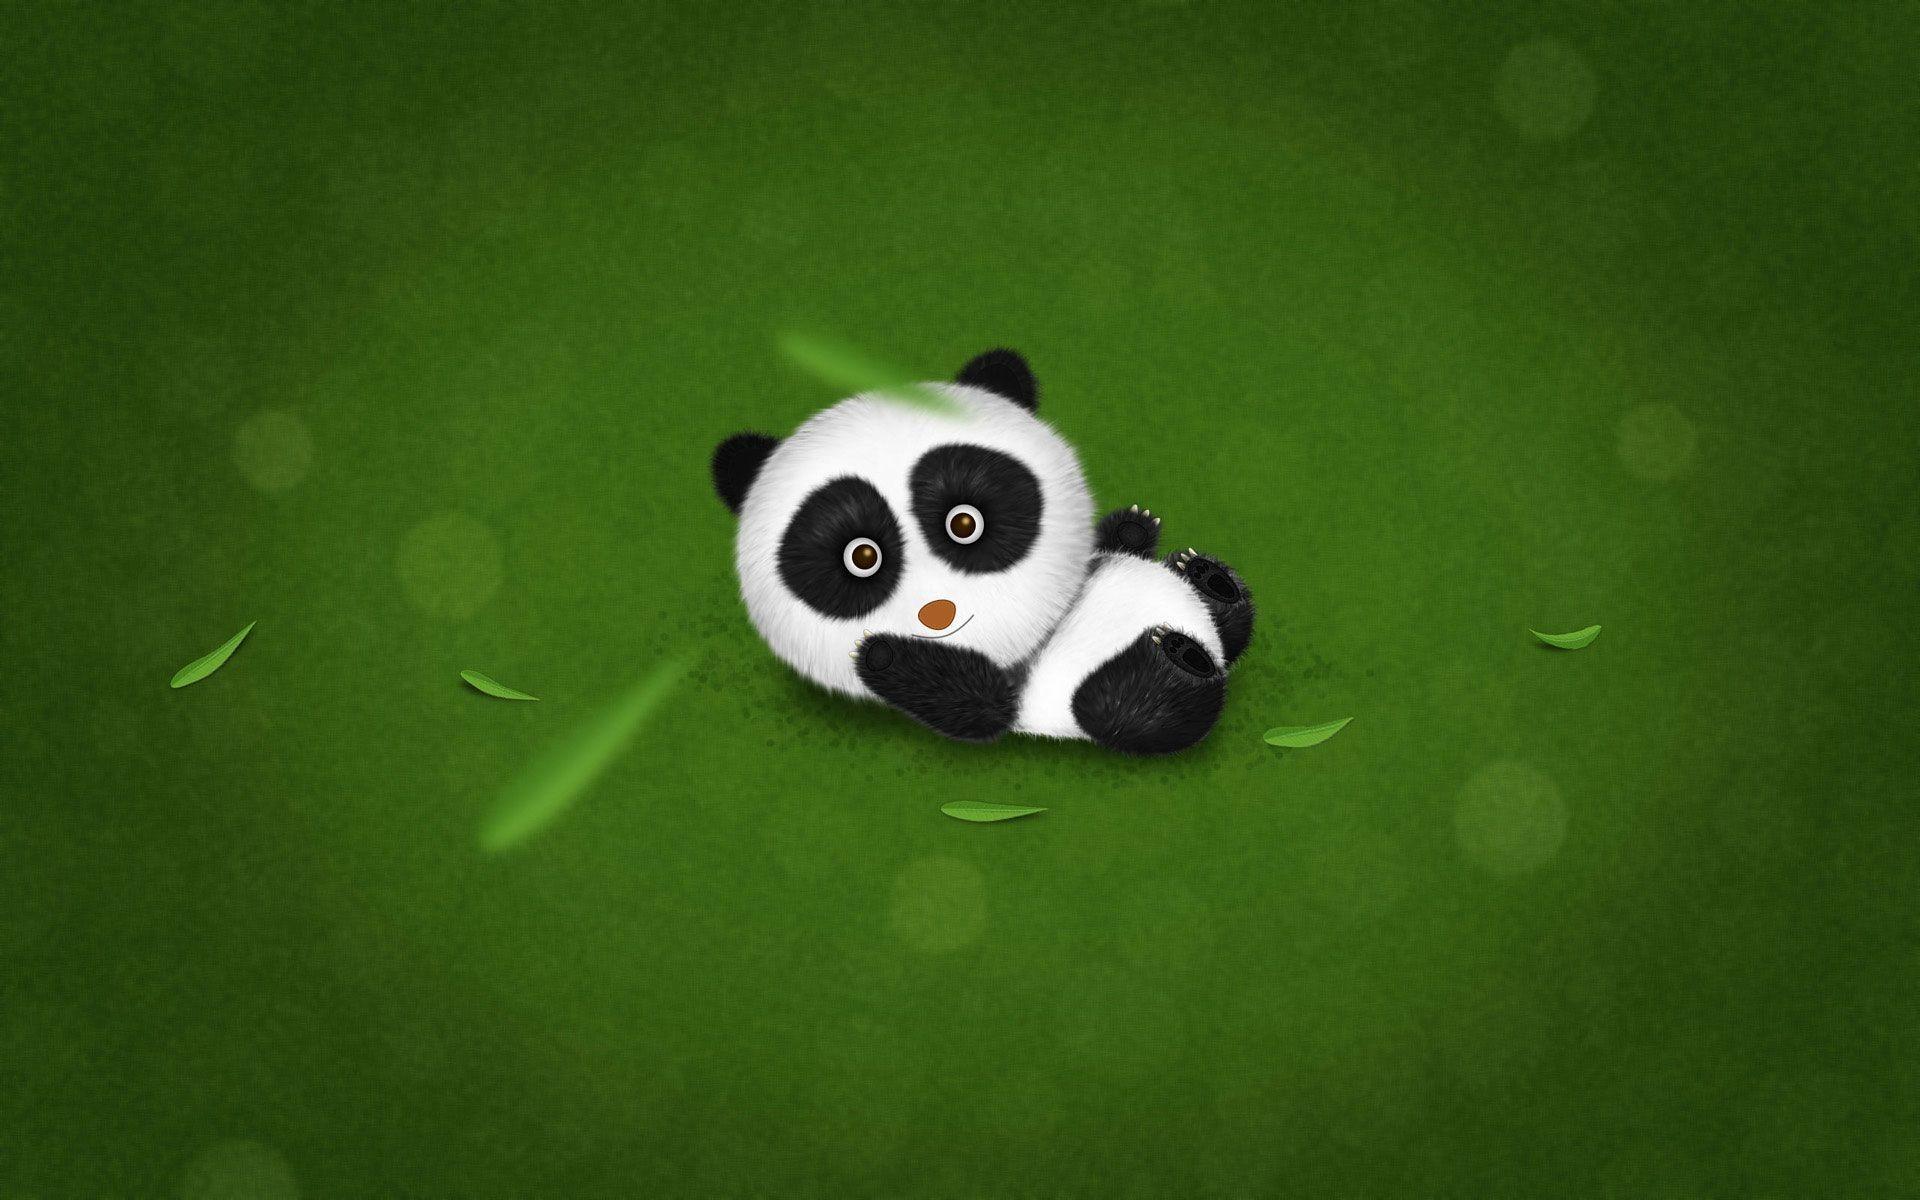 cute baby panda themed wallpaper for desktops (Berton Edwards 1920 x